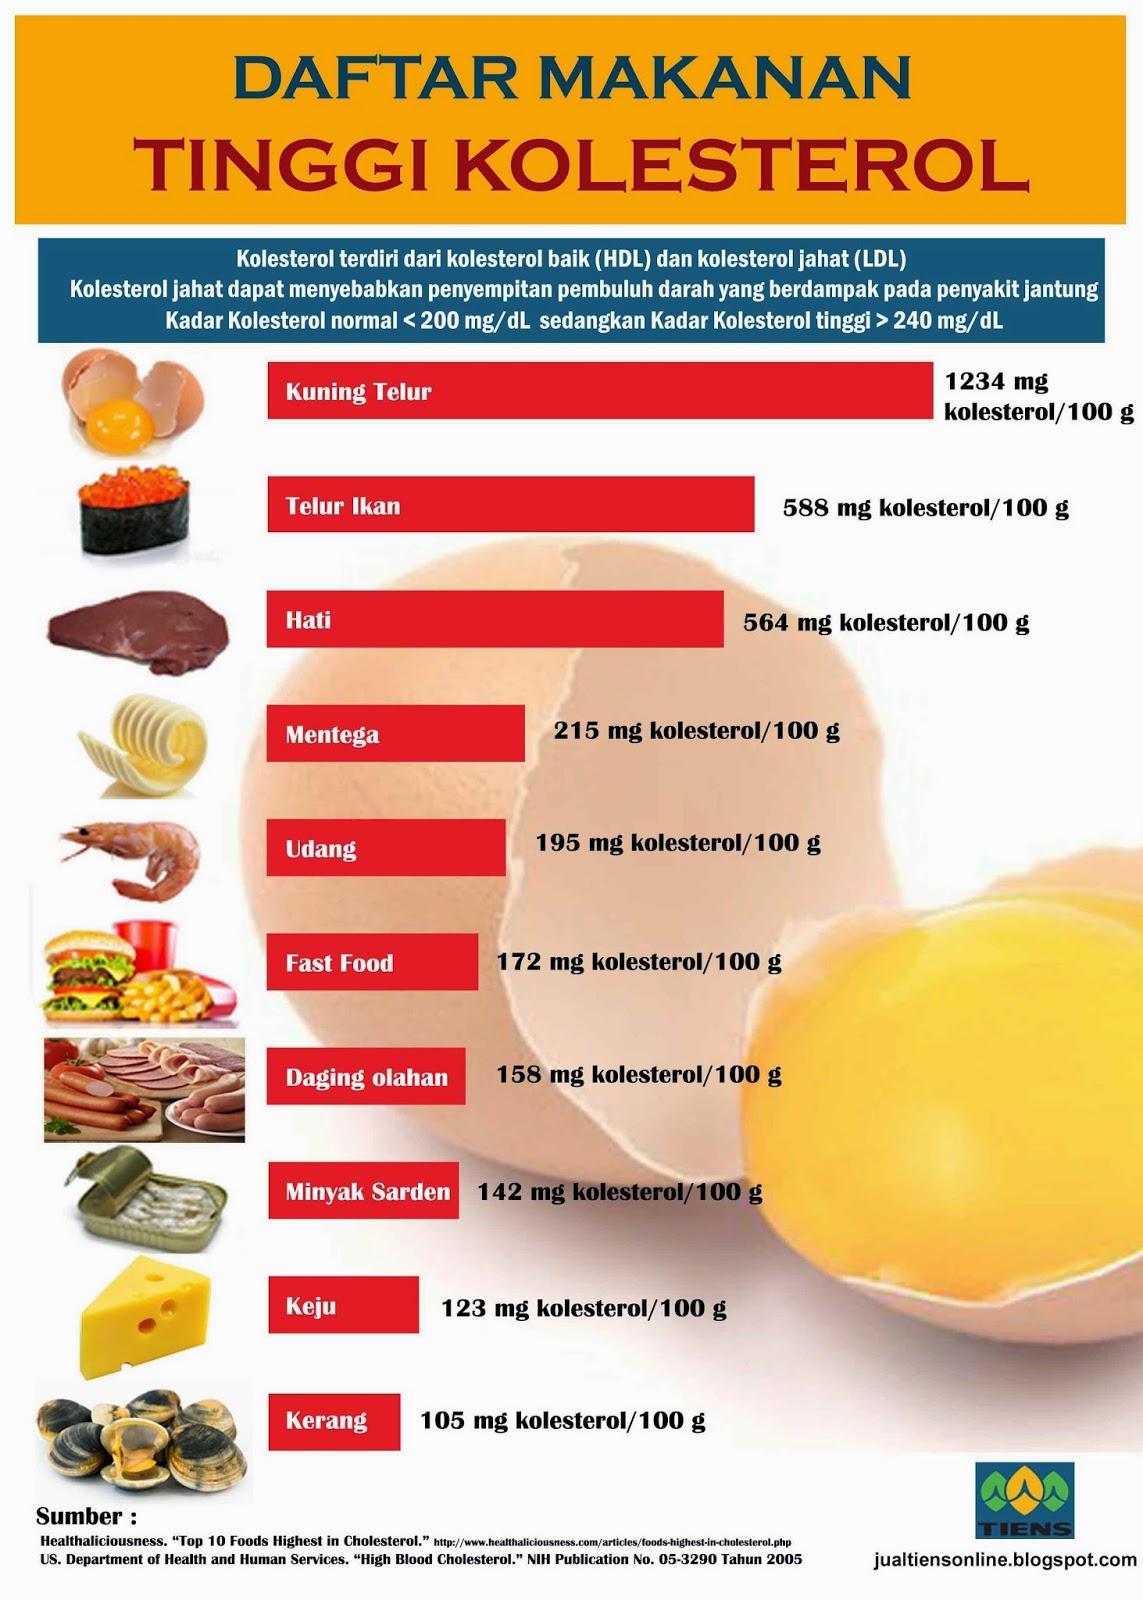 daftar makanan tinggi kolesterol